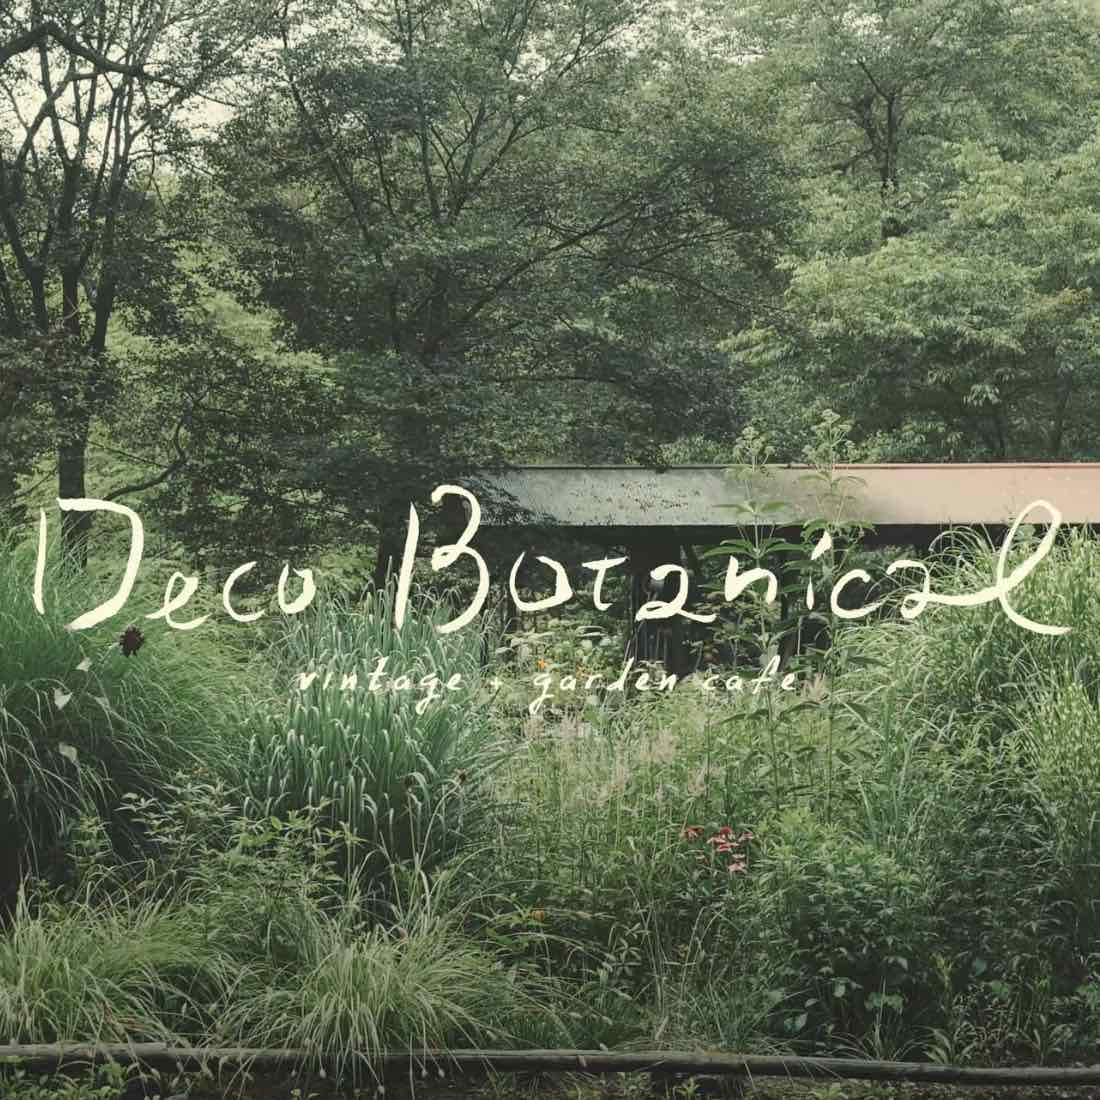 DECO BOTANICAL GARDEN MOVIE -2021